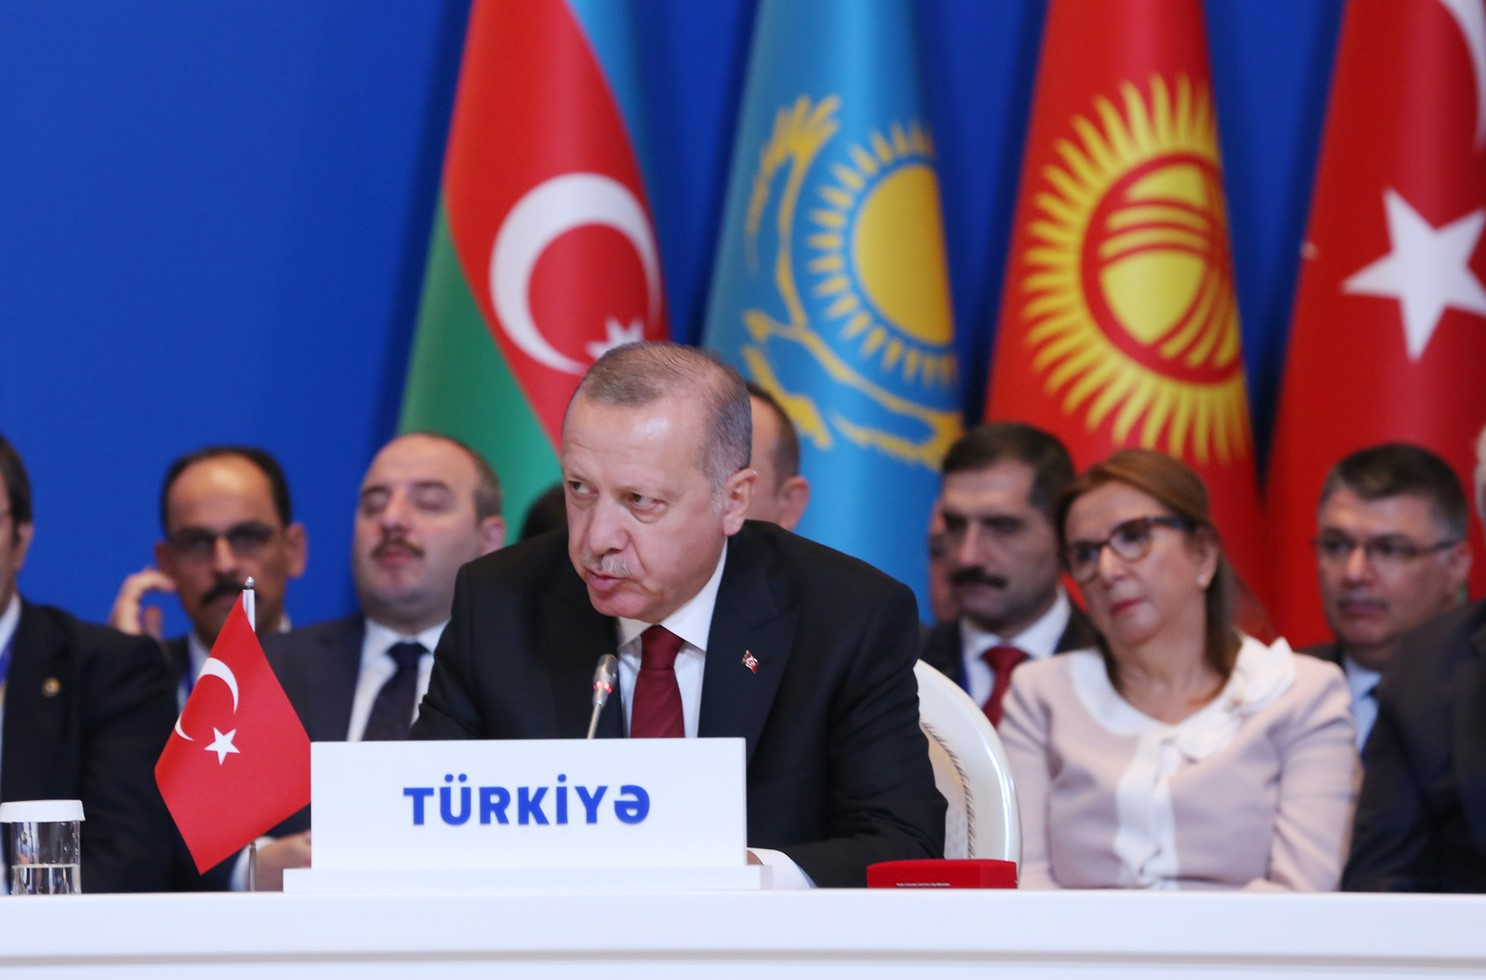 Baku hosts 7th Summit of Cooperation Council of Turkic Speaking States 05 Грузия-Турция Грузия-Турция